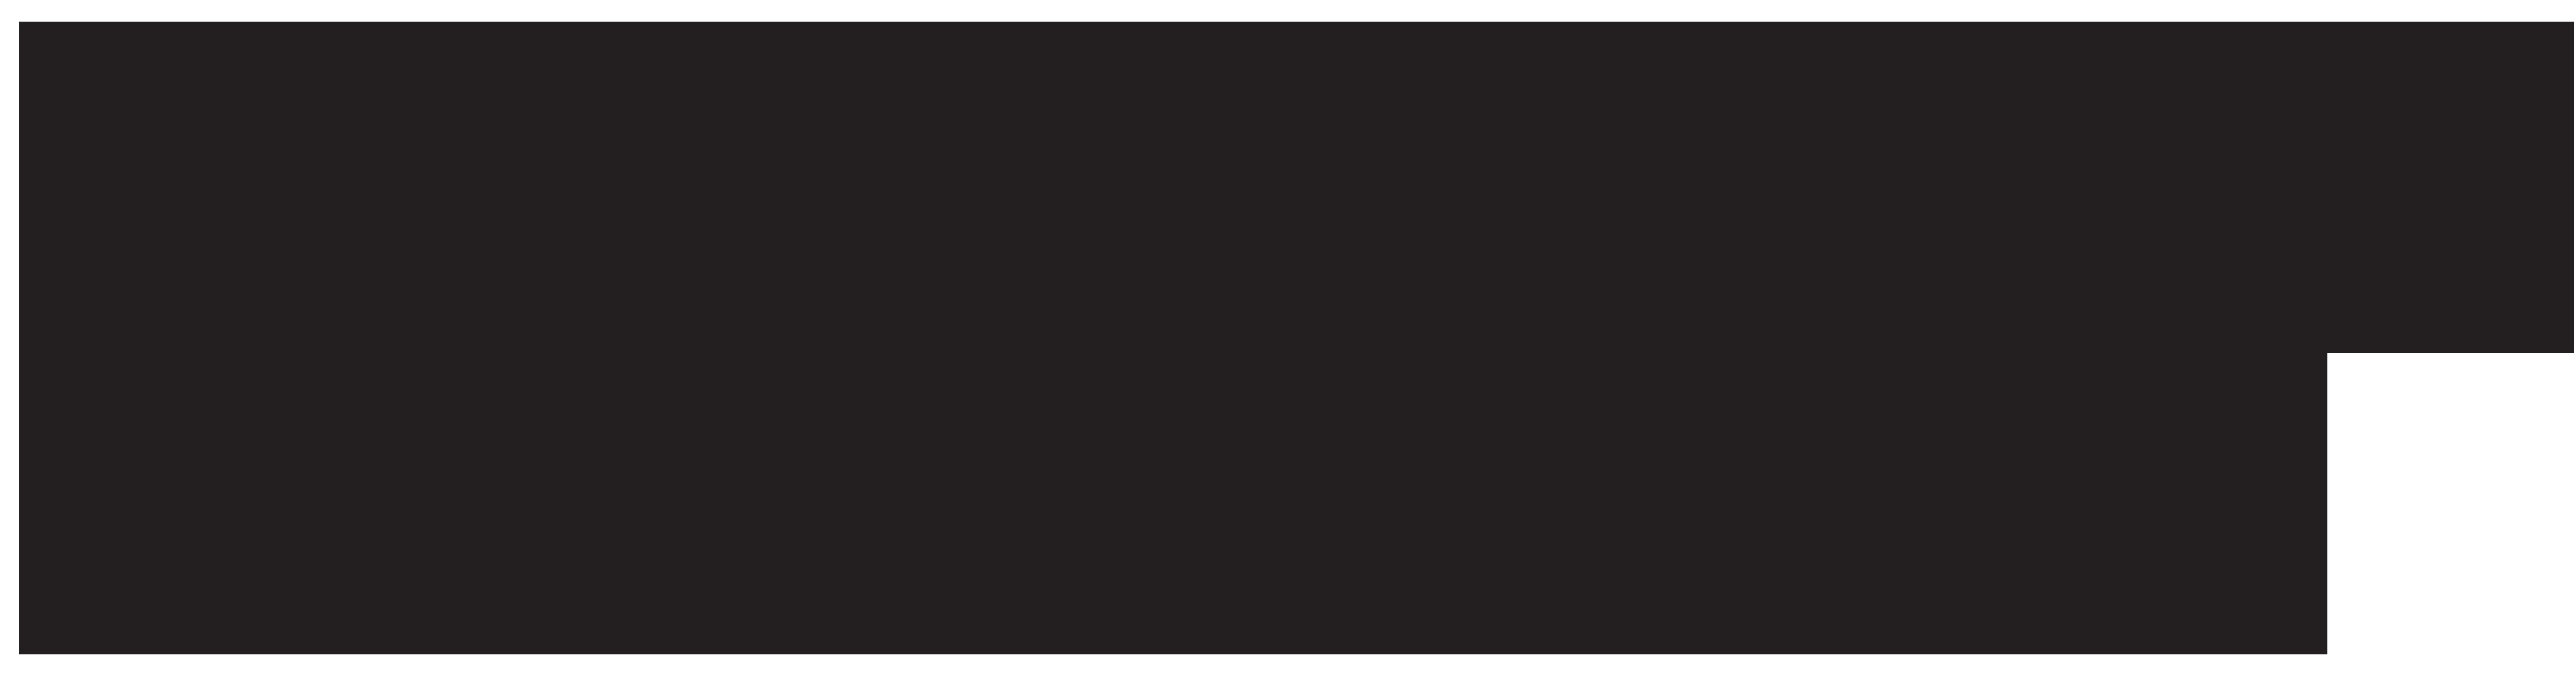 8000x2098 Fish Passage Silhouette Png Clip Art Imageu200b Gallery Yopriceville